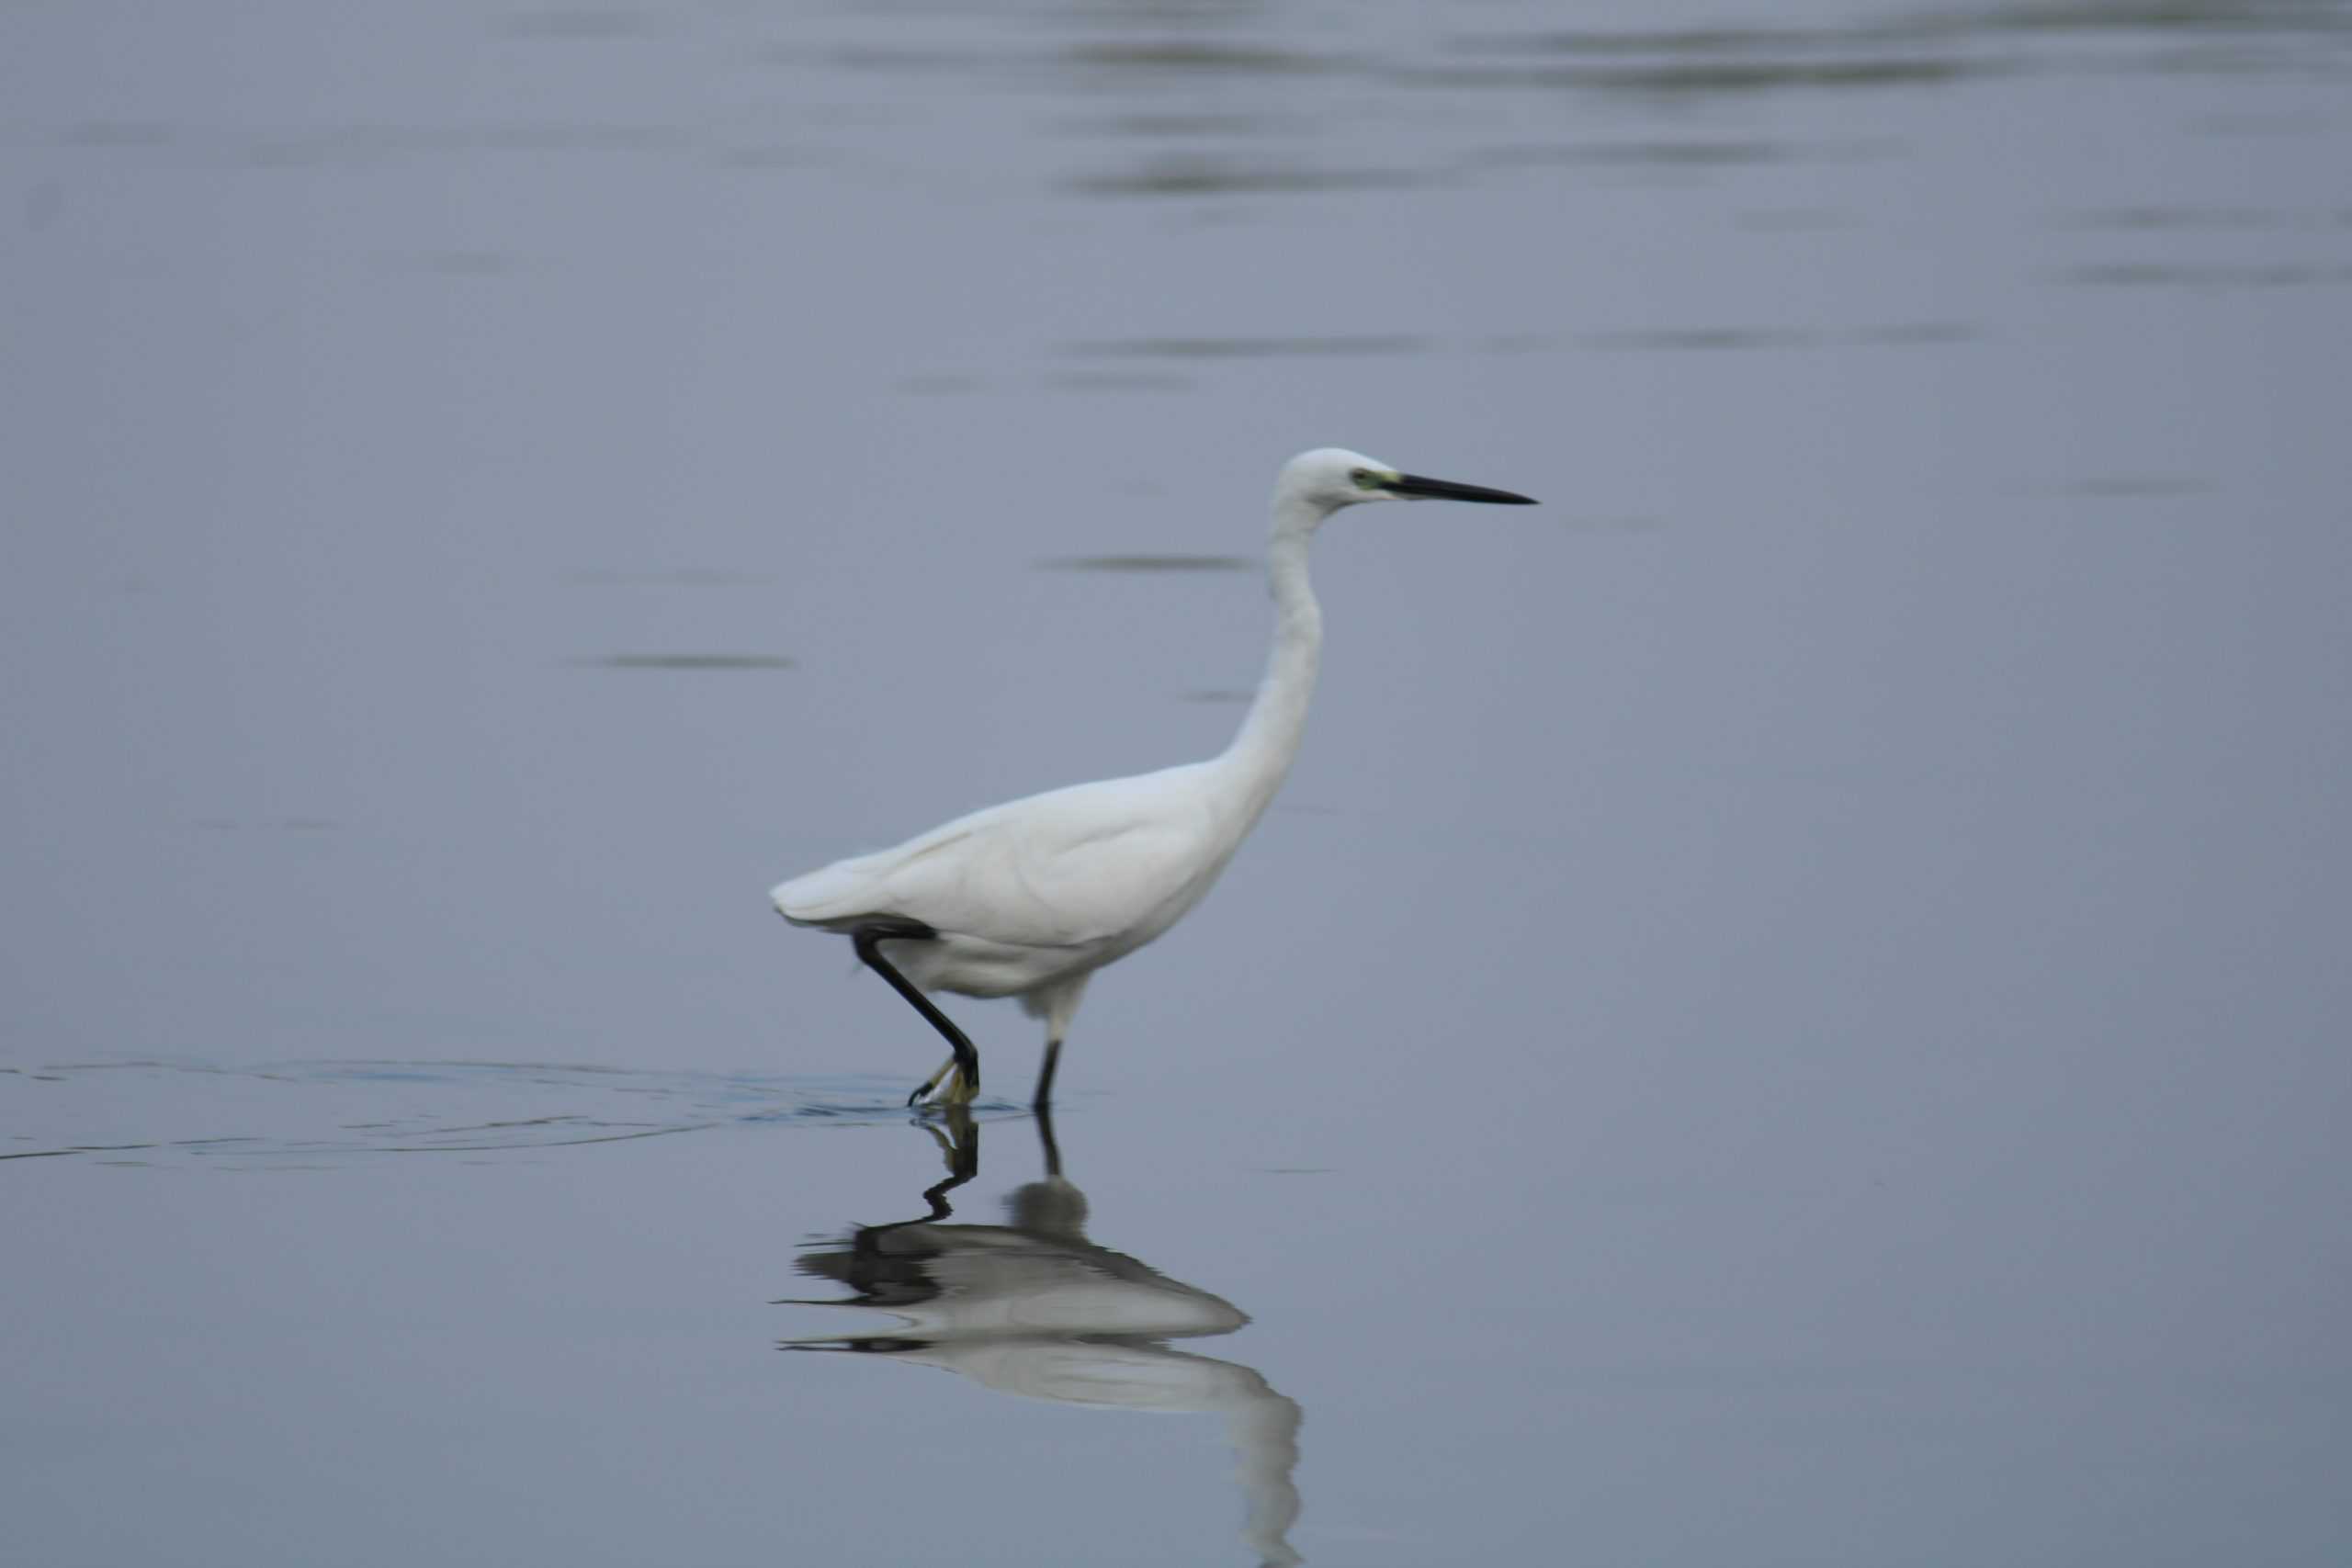 Crane bird in the river